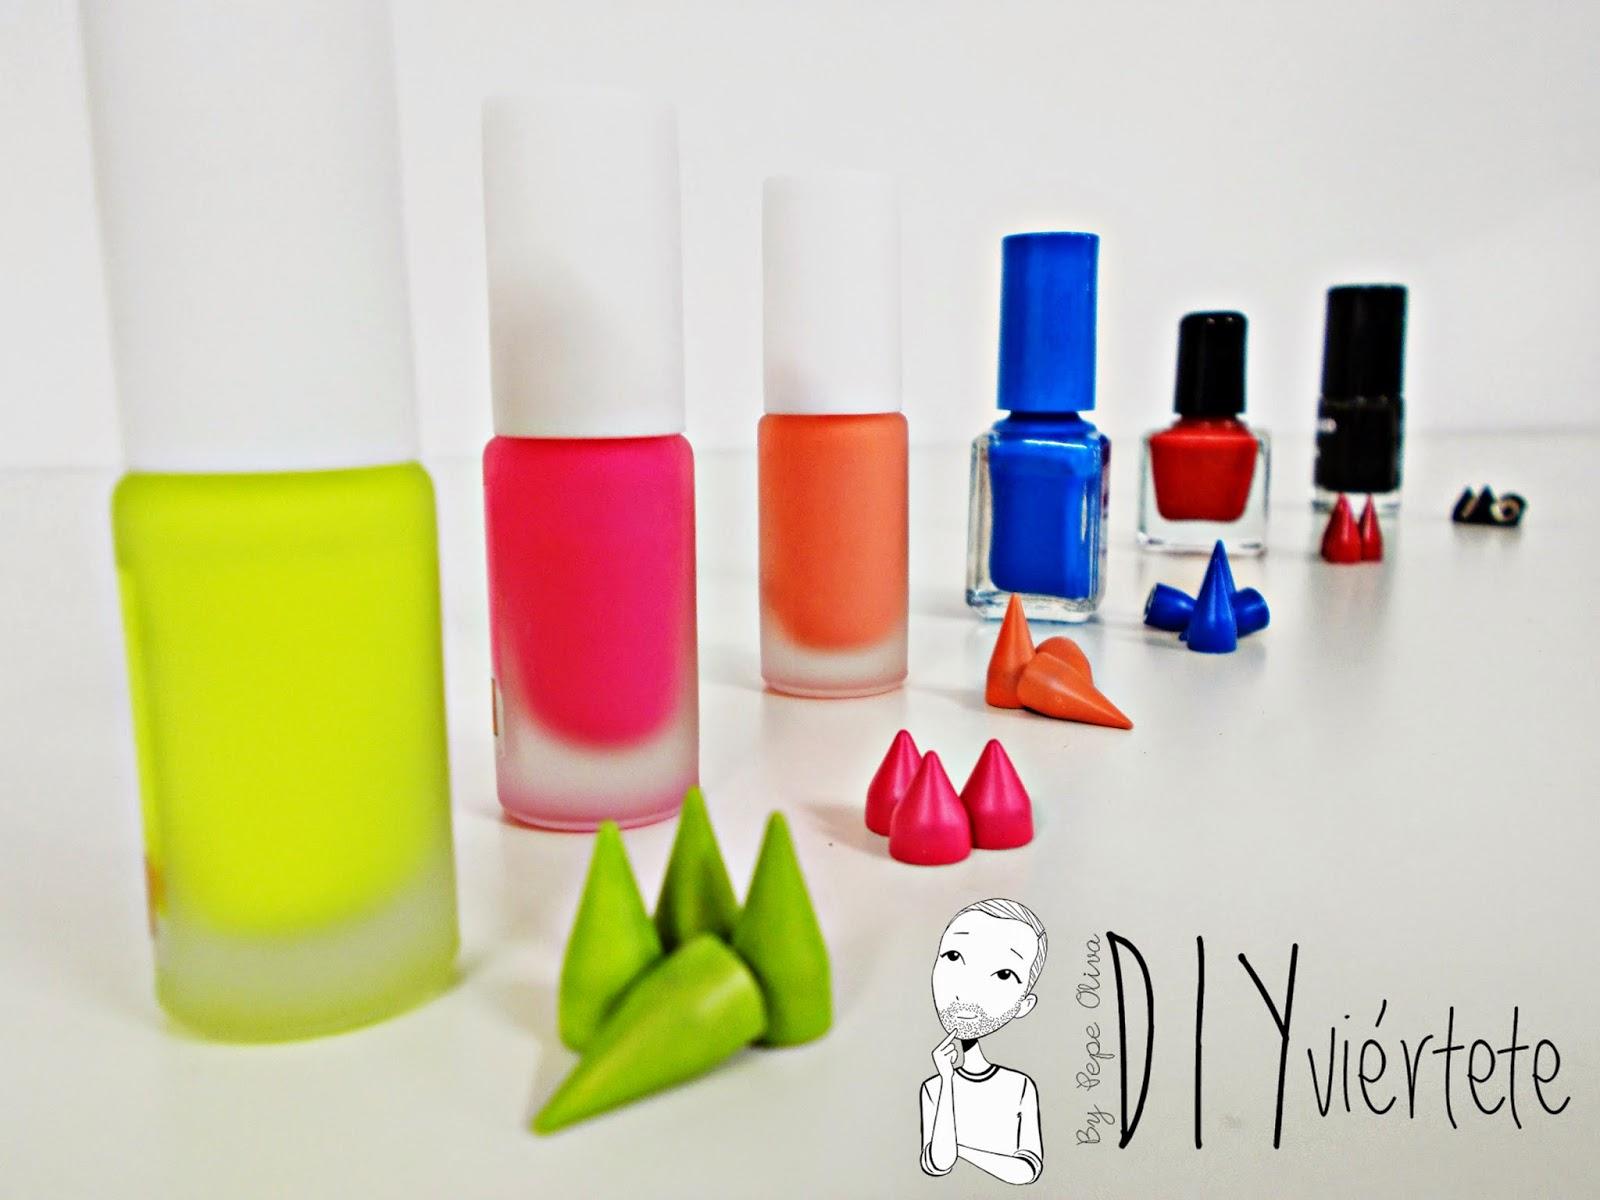 DIY-zapatillas-tunear-customizar-CHRISTIAN-LOUBOUTIN-zapatos-pinchos-esmaltes-pinta uñas-colores-6